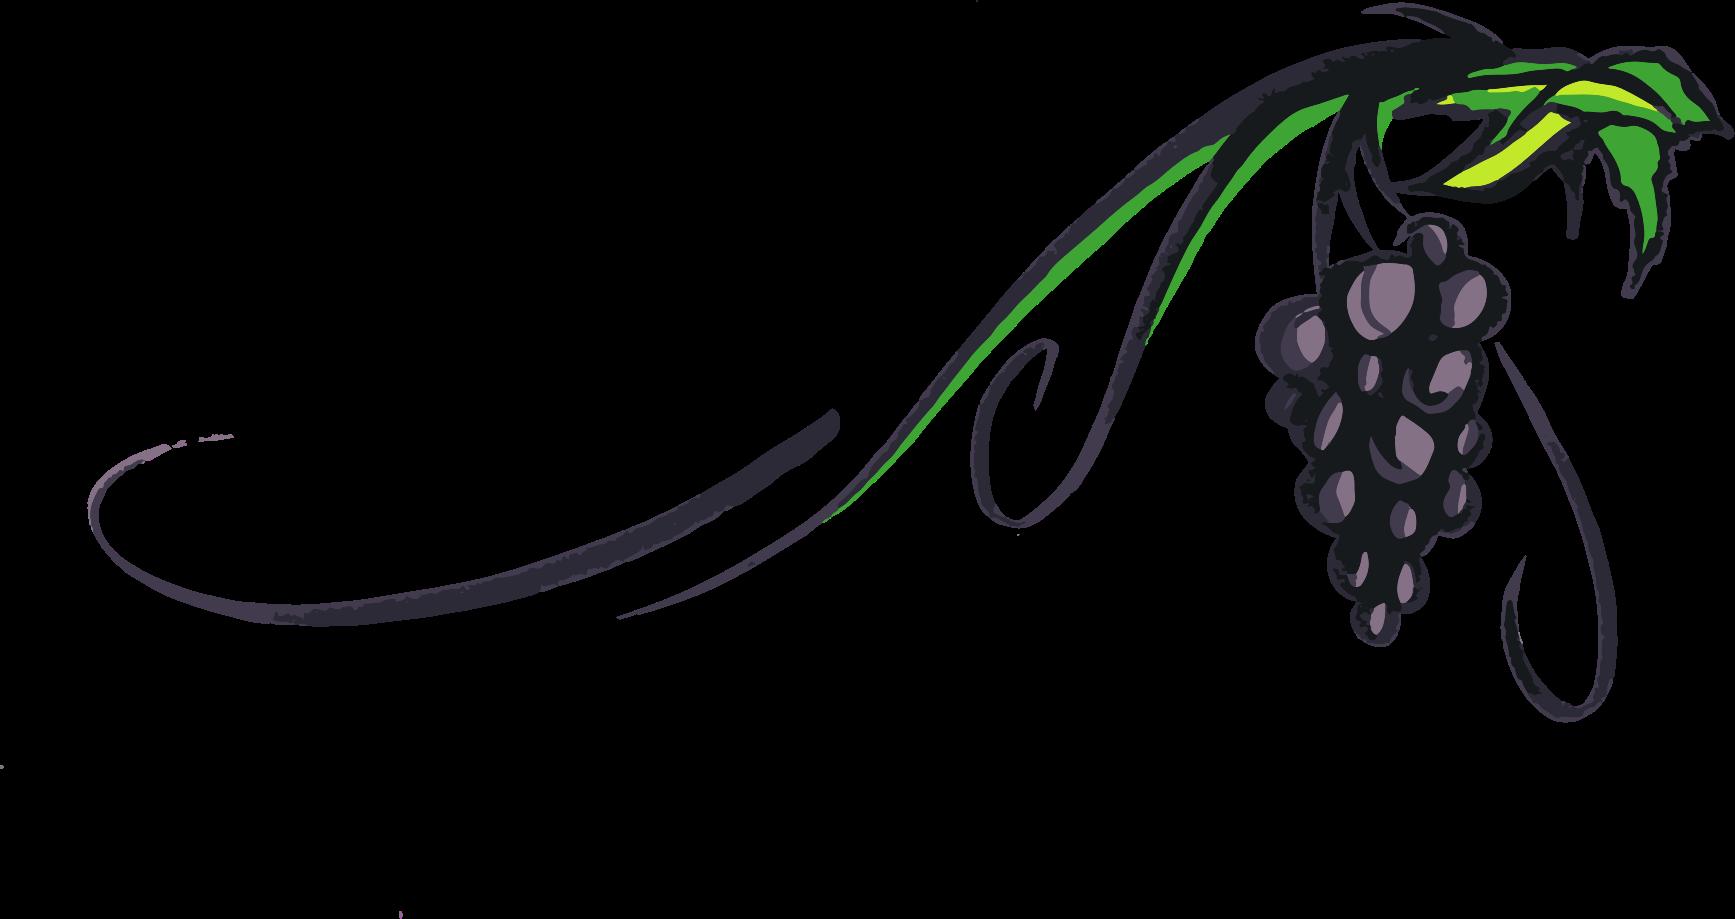 Raseone grape vine by. Vines clipart hand drawn